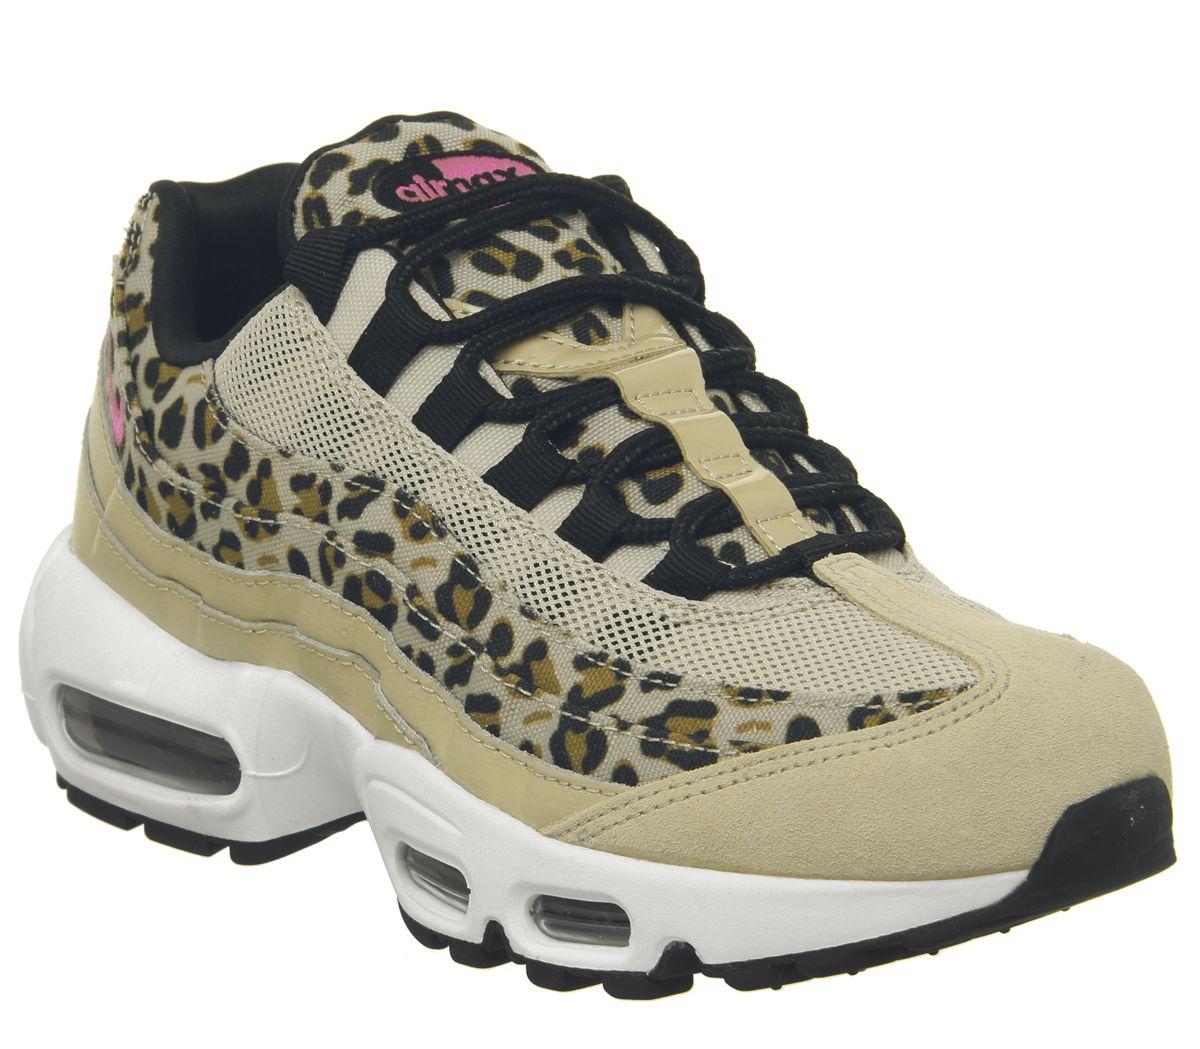 online store b6331 f49cf Nike Air Max 95 Trainers Desert Ore Wheat Leopard - Hers ...